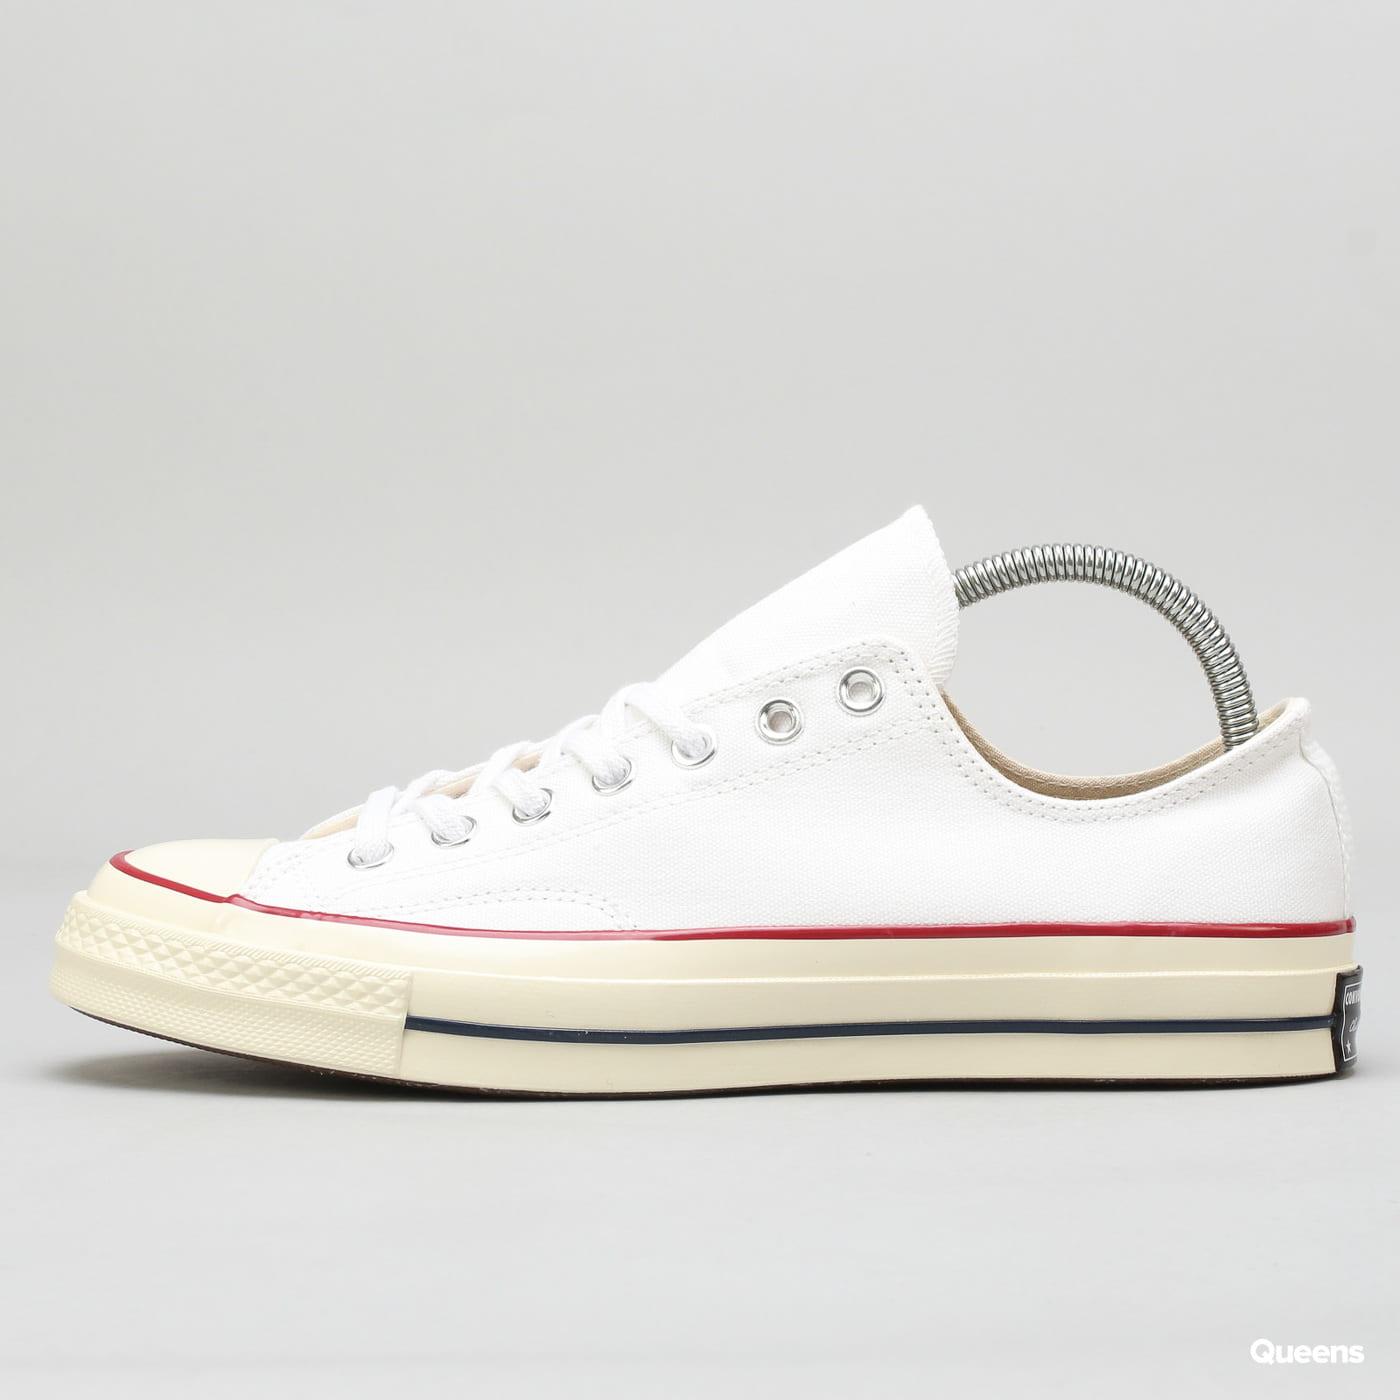 Converse Chuck Taylor All Star 70 OX white / garnet / egret